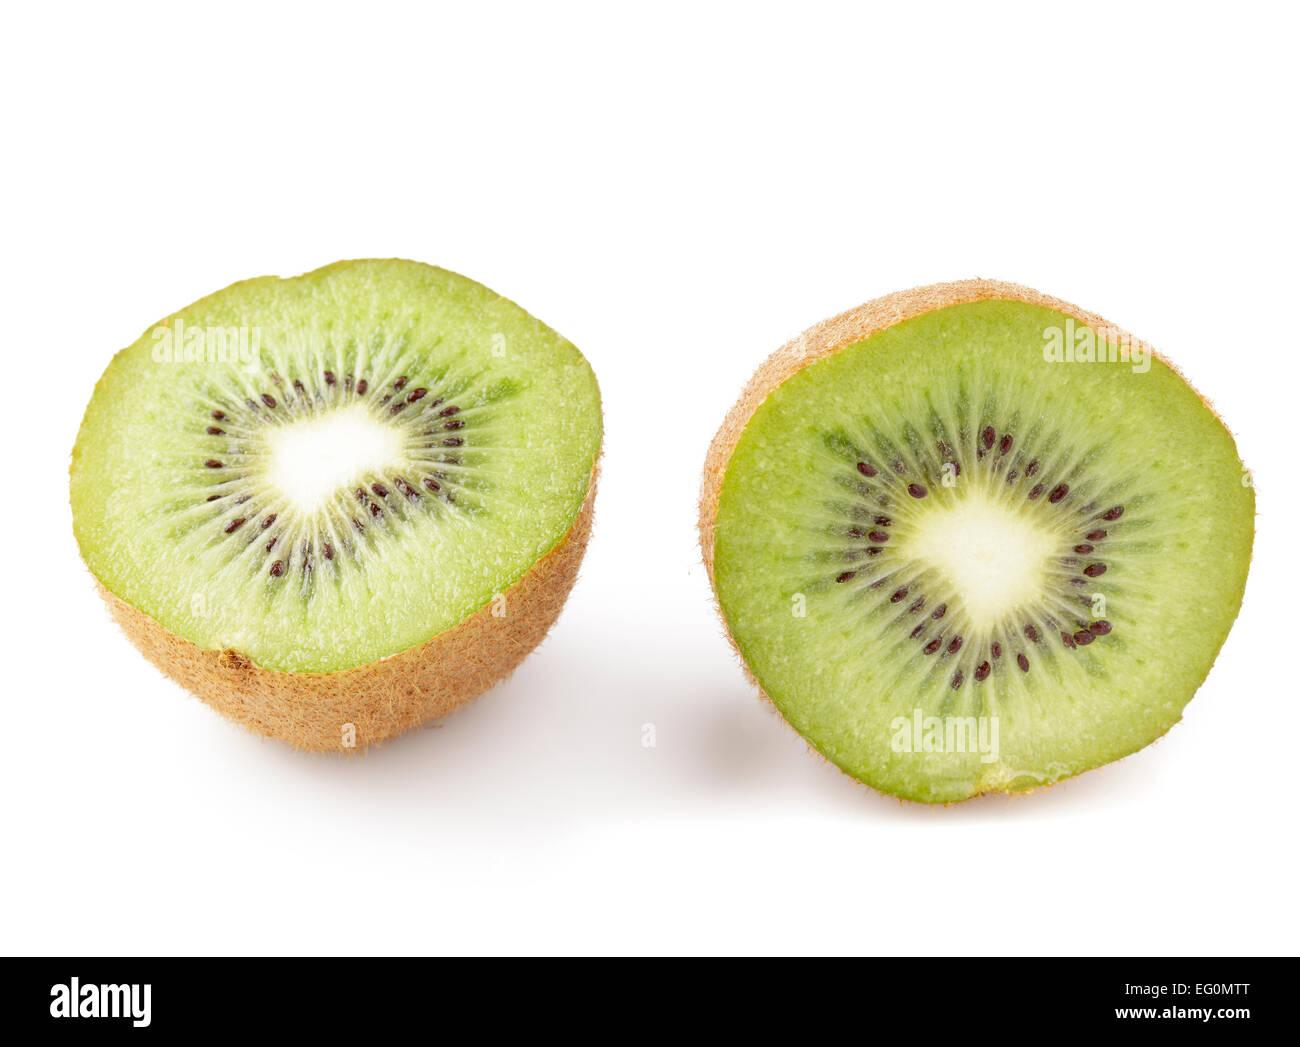 kiwi fruit cut in half - Stock Image